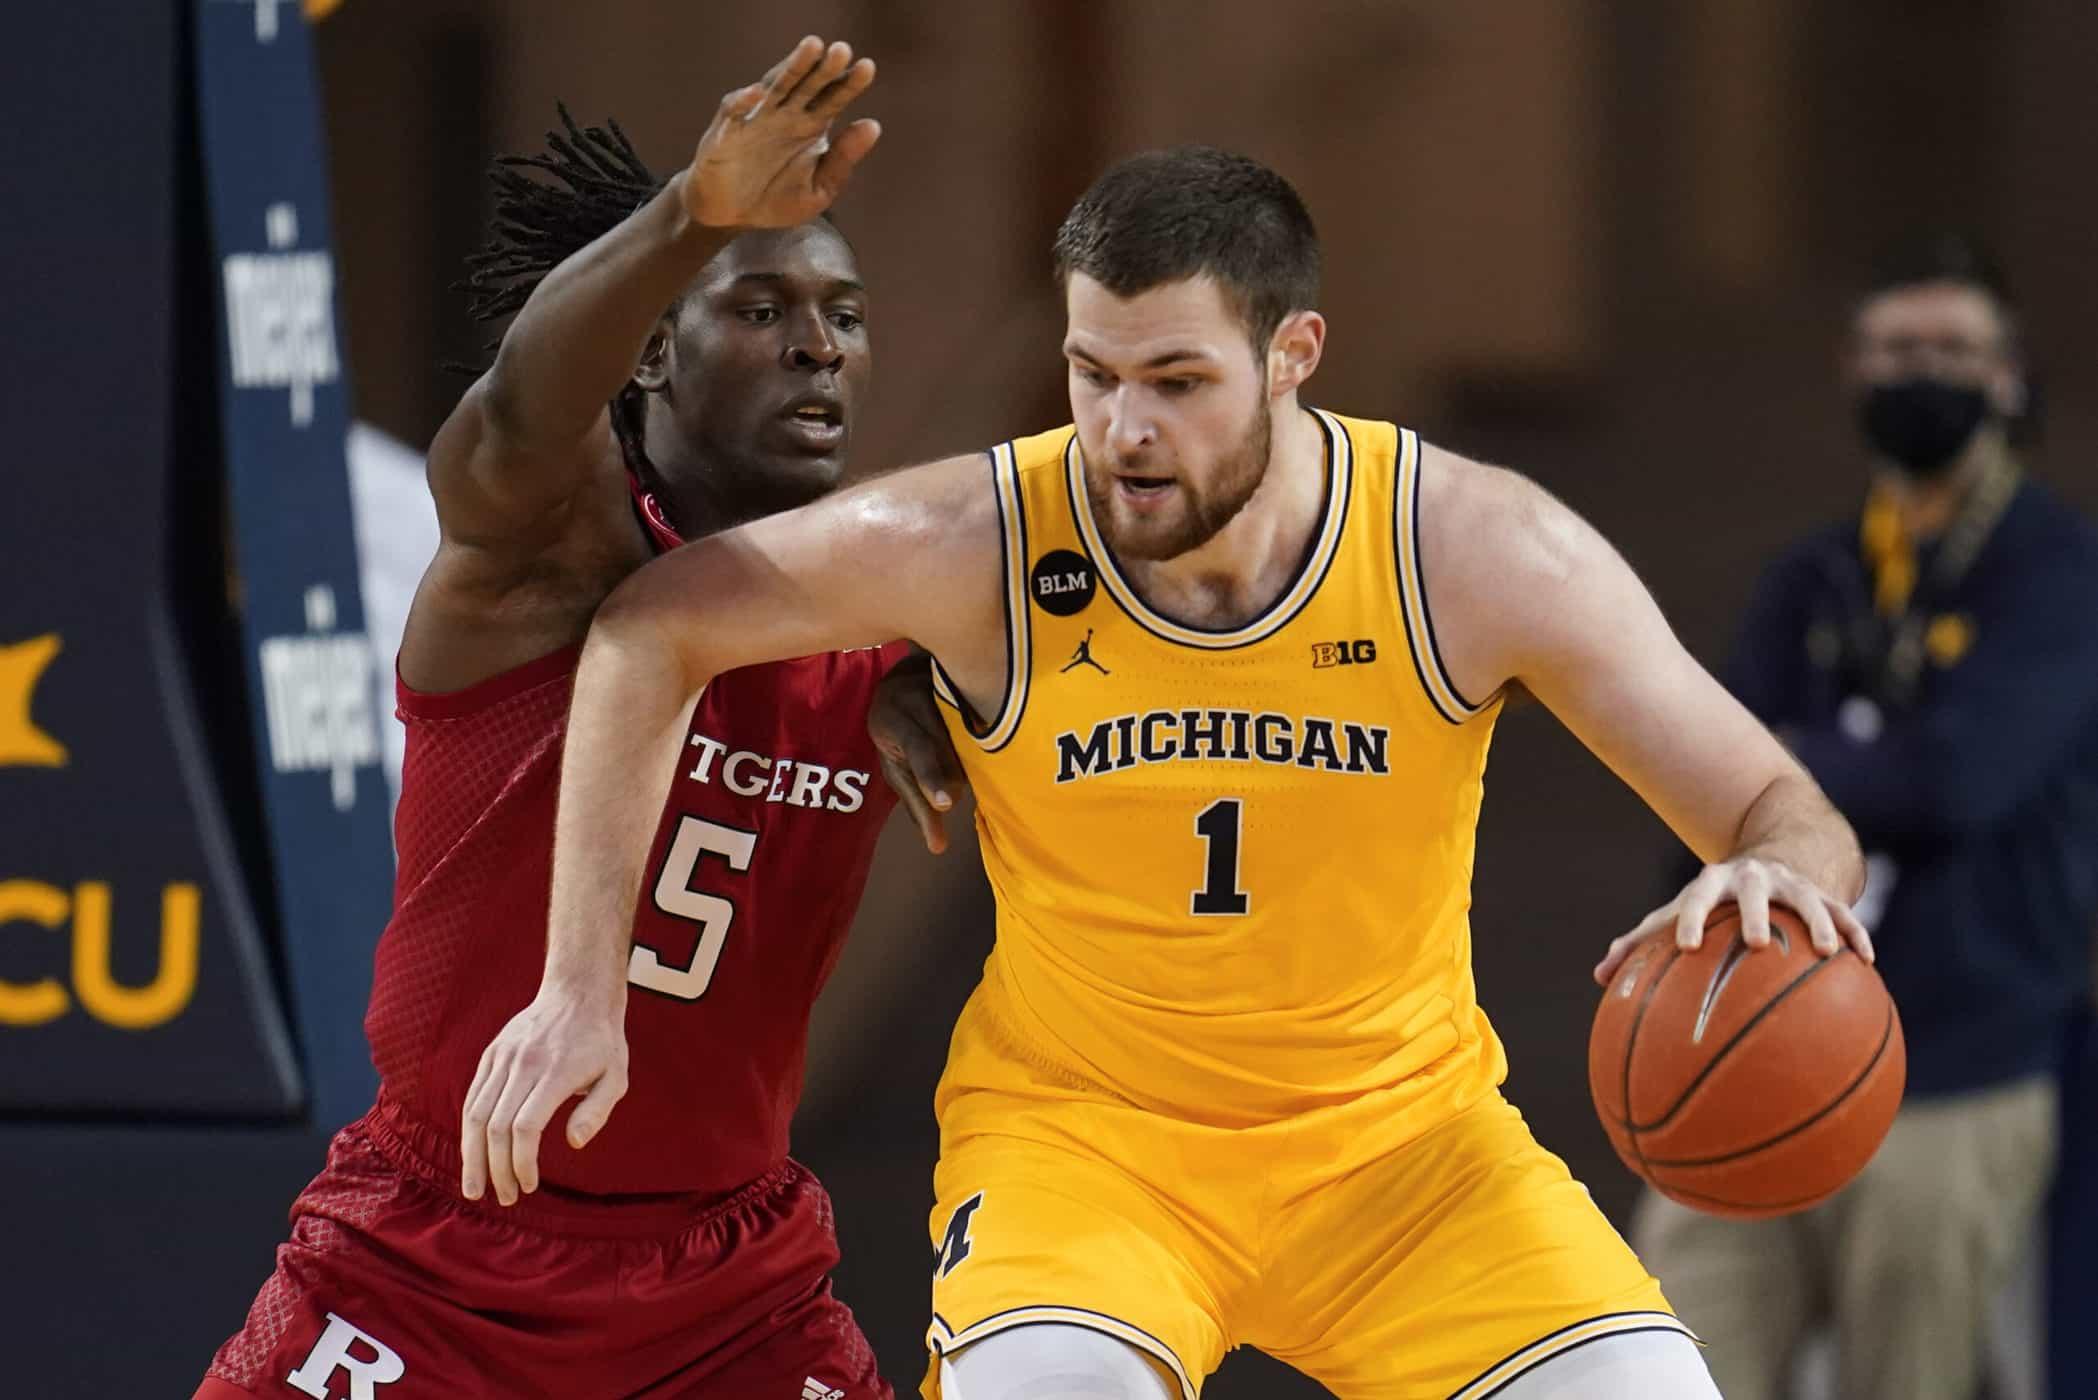 Basketballncaa - Hunter Dickinson - Michigan